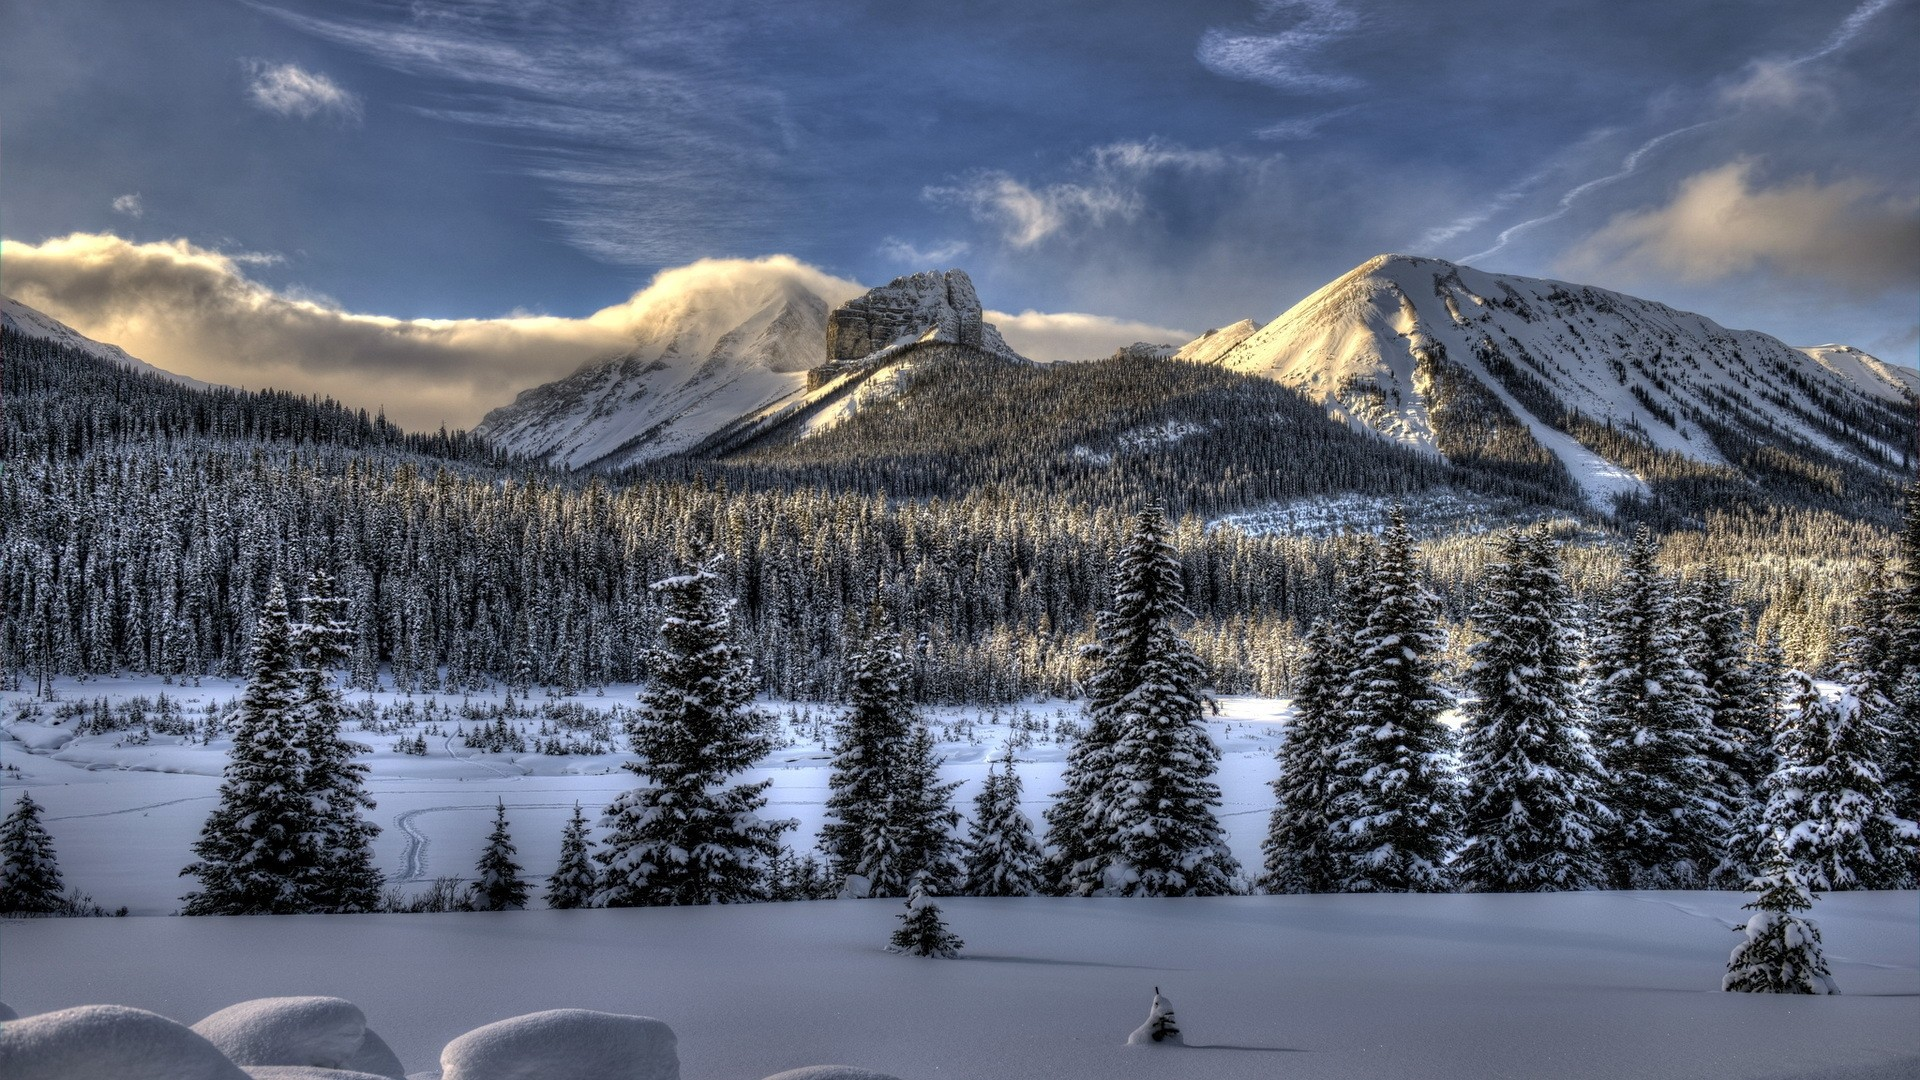 Snowy Full HD Wallpaper